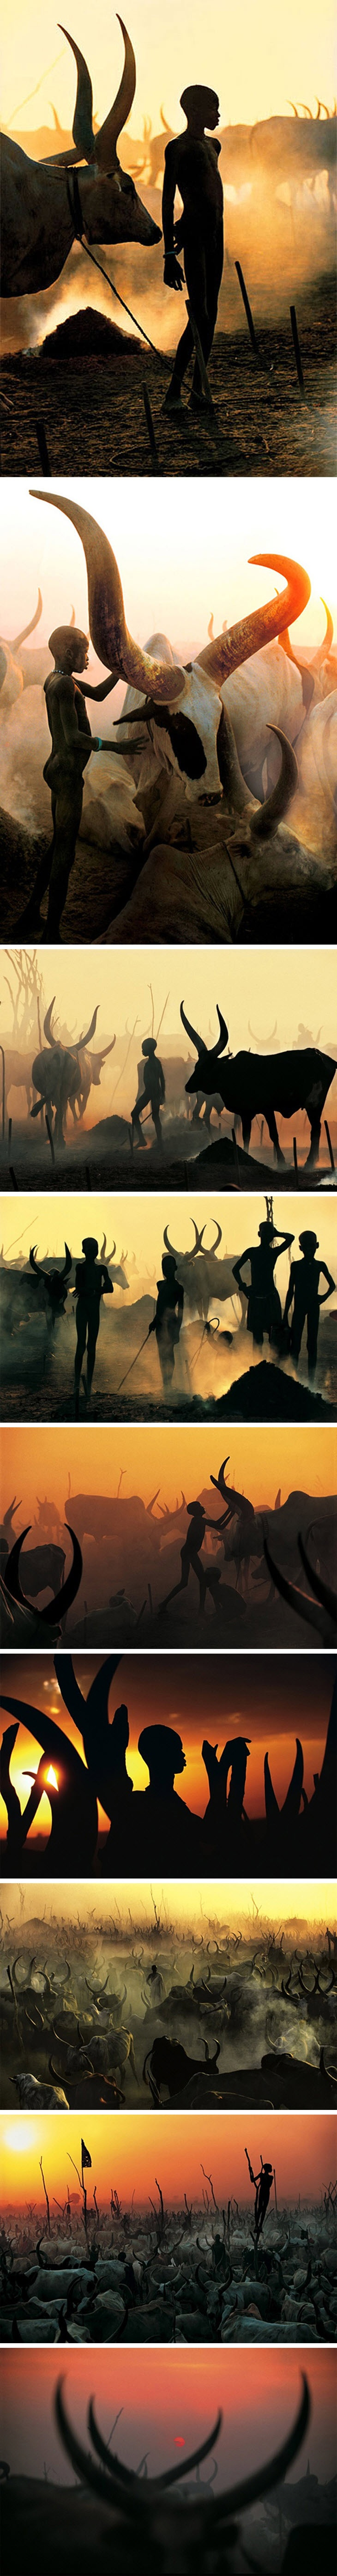 Dinka by Carol Beckwith & Angela Fisher